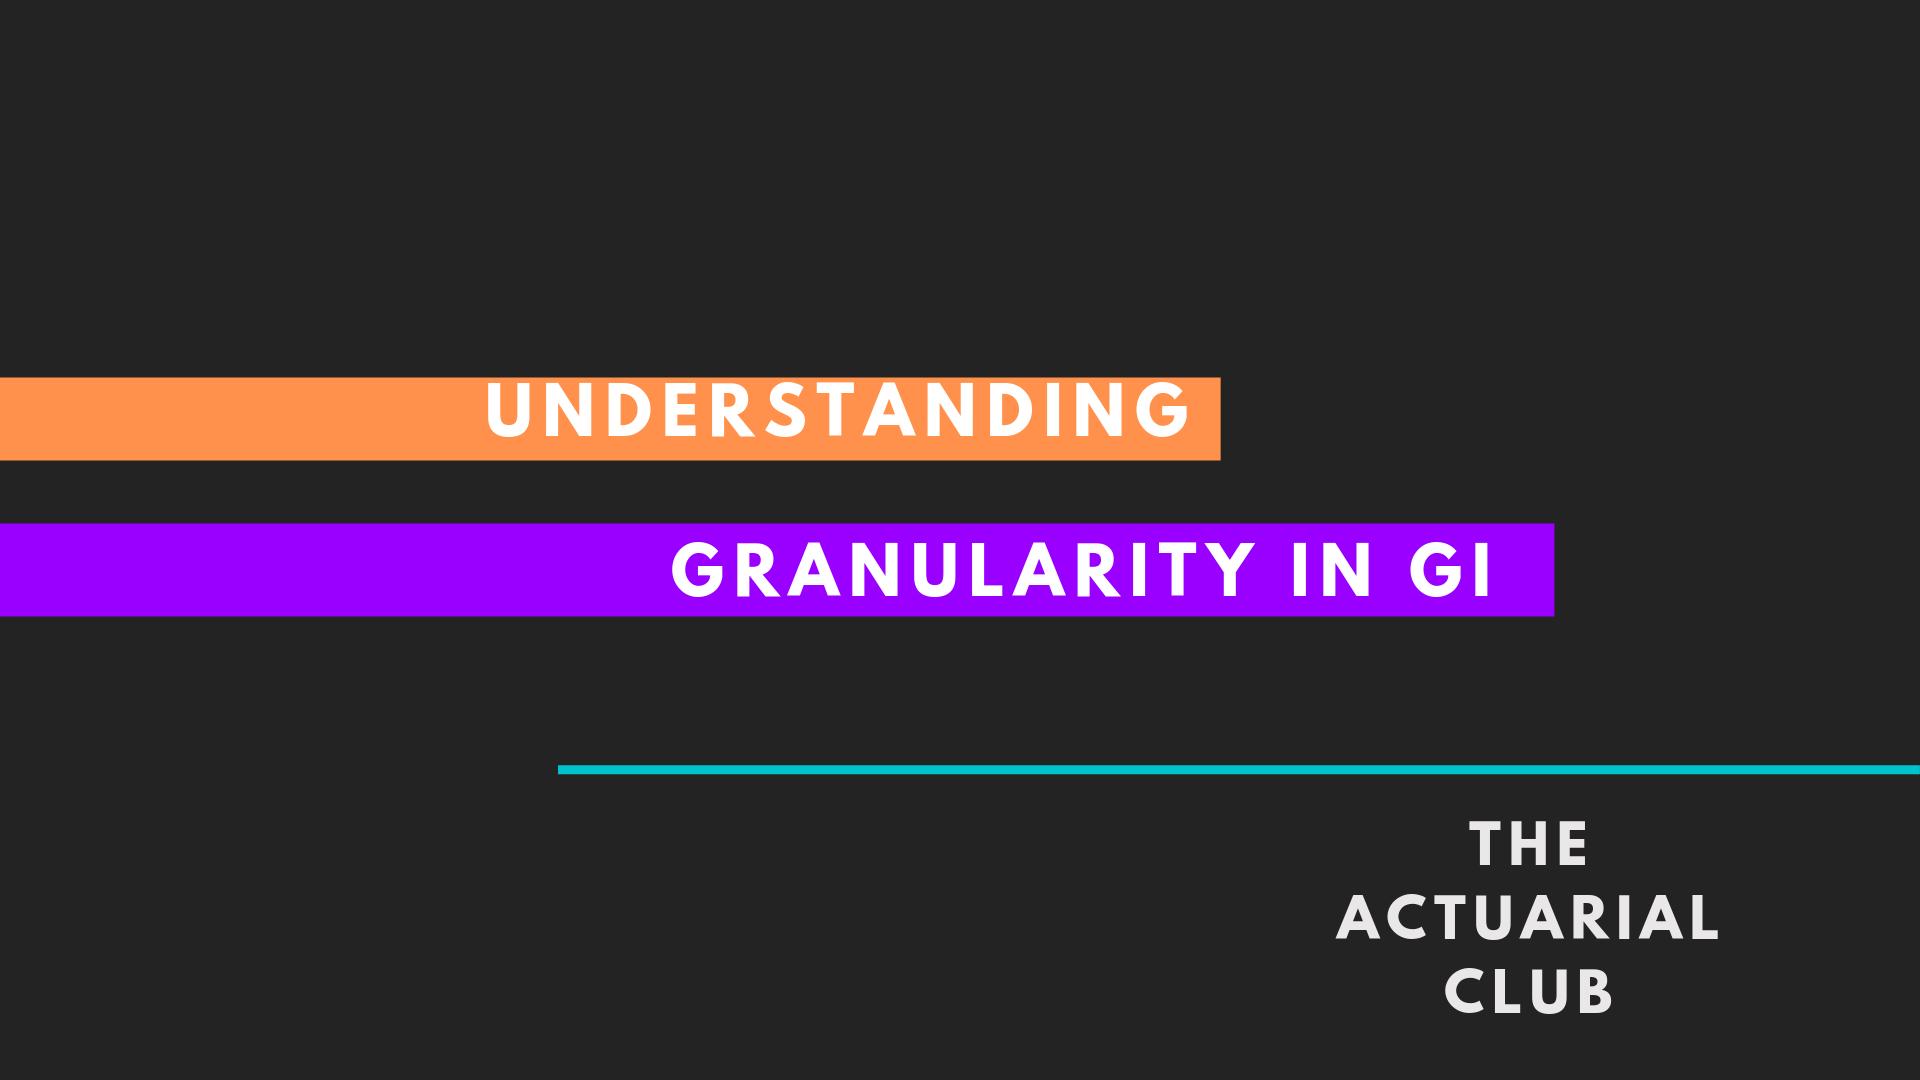 Granularity General Insurance